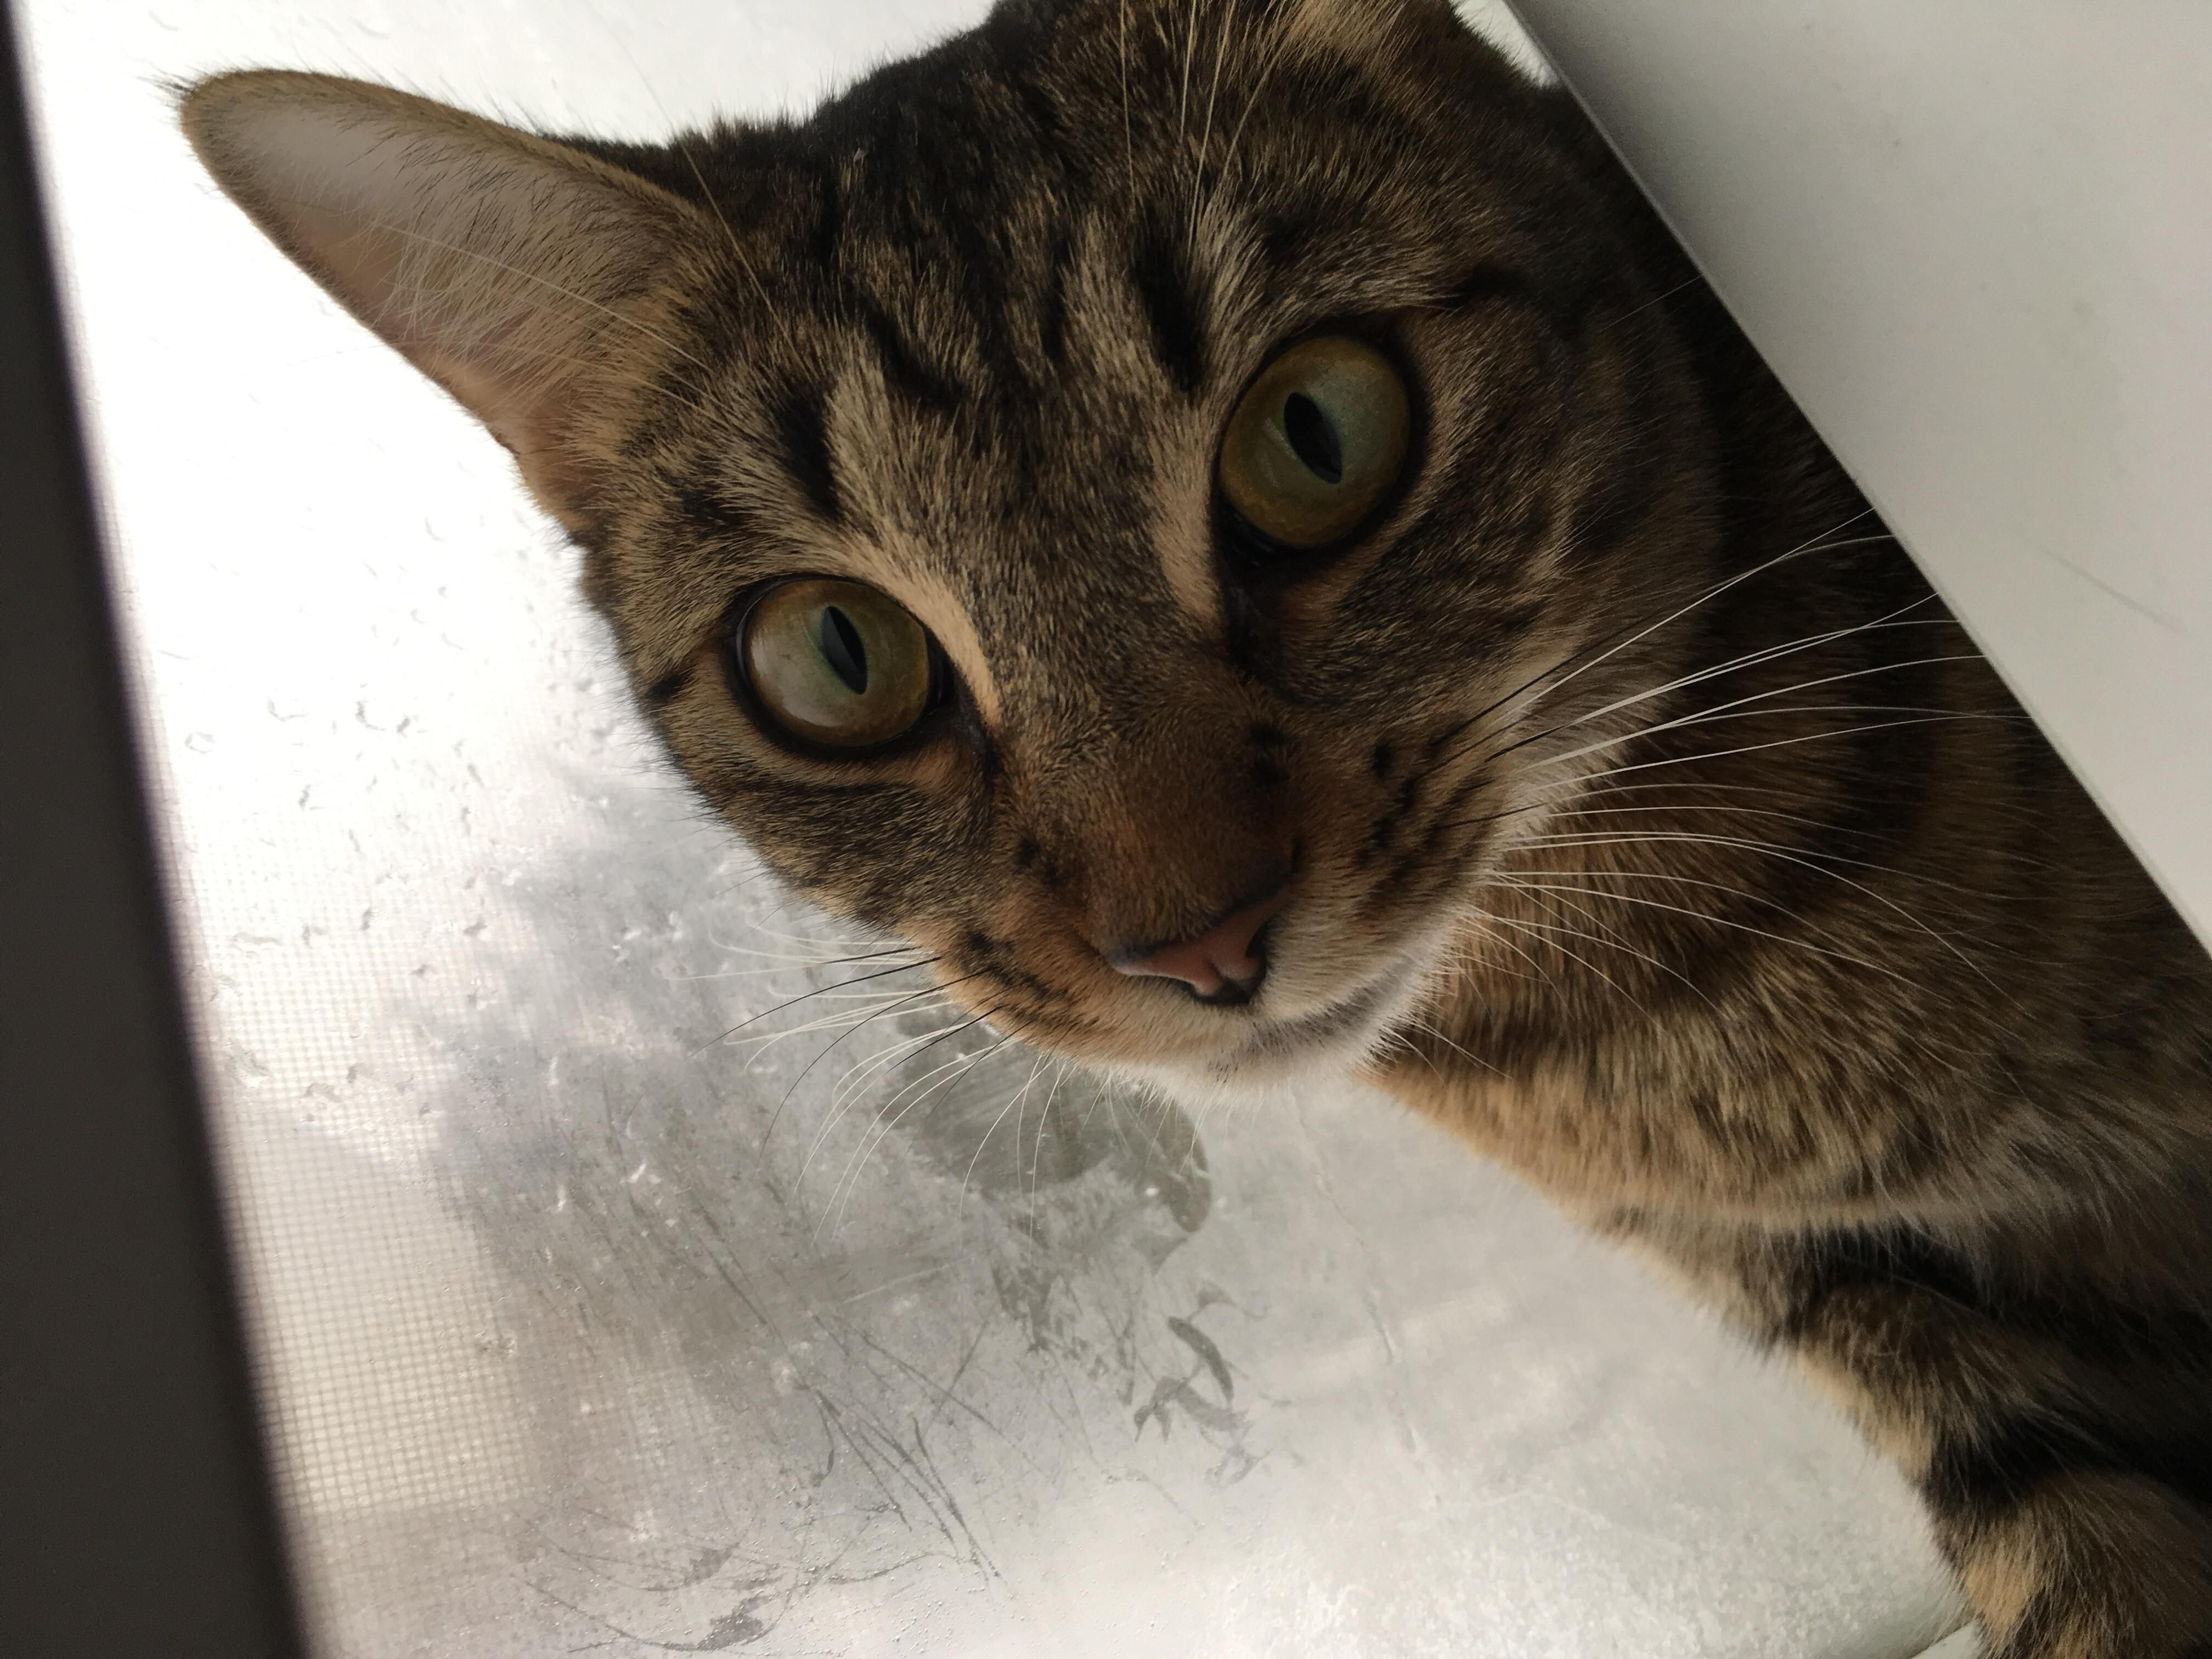 My new cat Remy http://ift.tt/2m69pdd